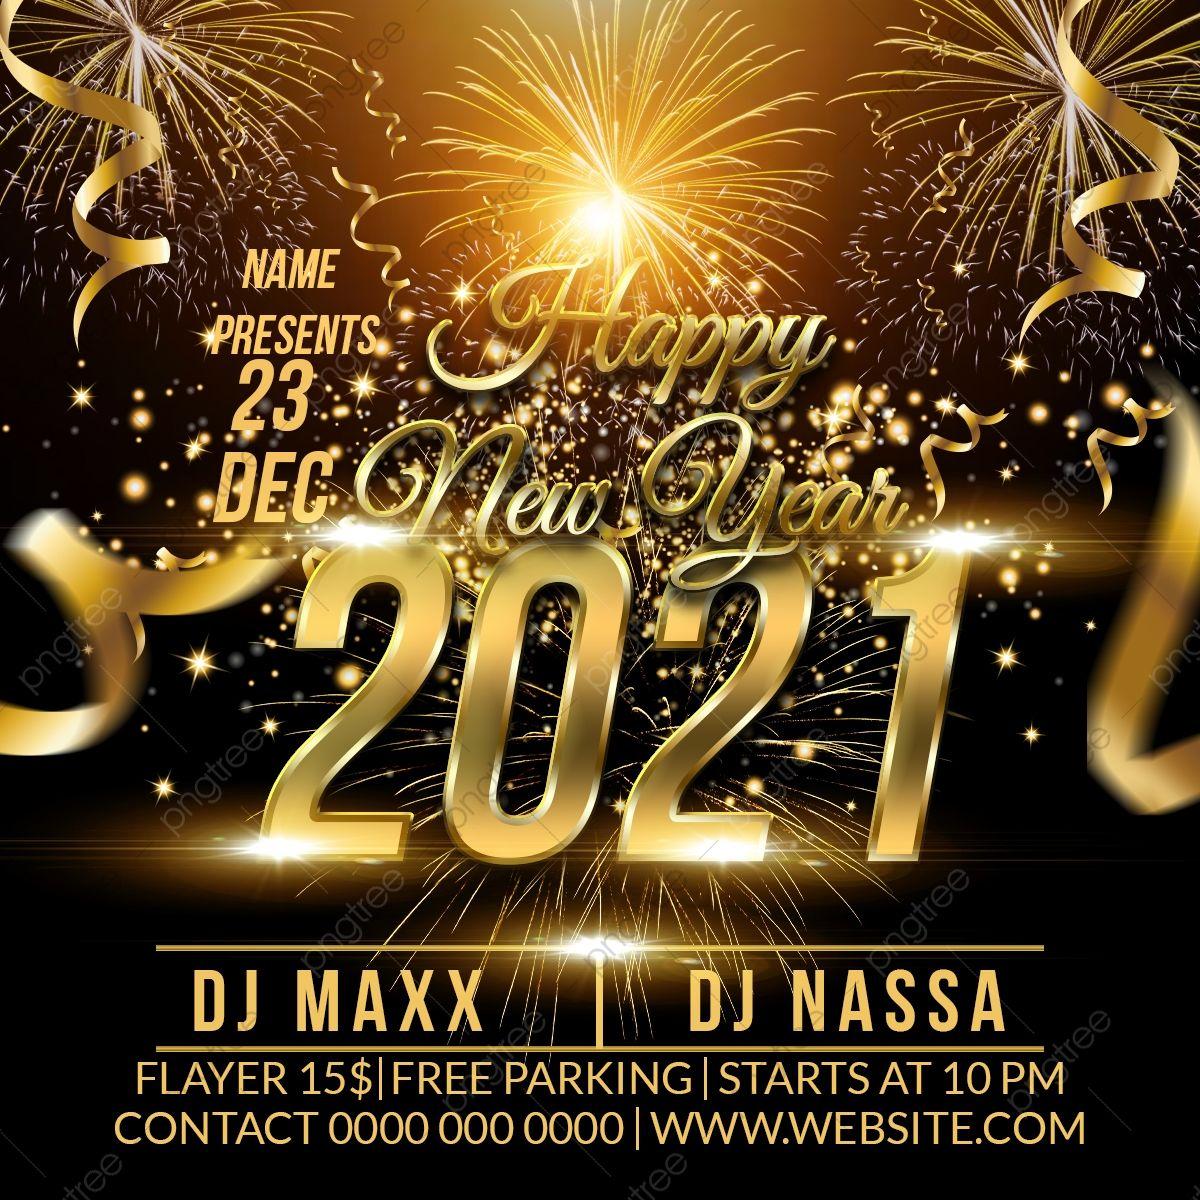 Happy New Years 2021 Dj Party Flyer In 2021 Happy New Years 2021 Happy New Year Banner 2021 Happy New Year